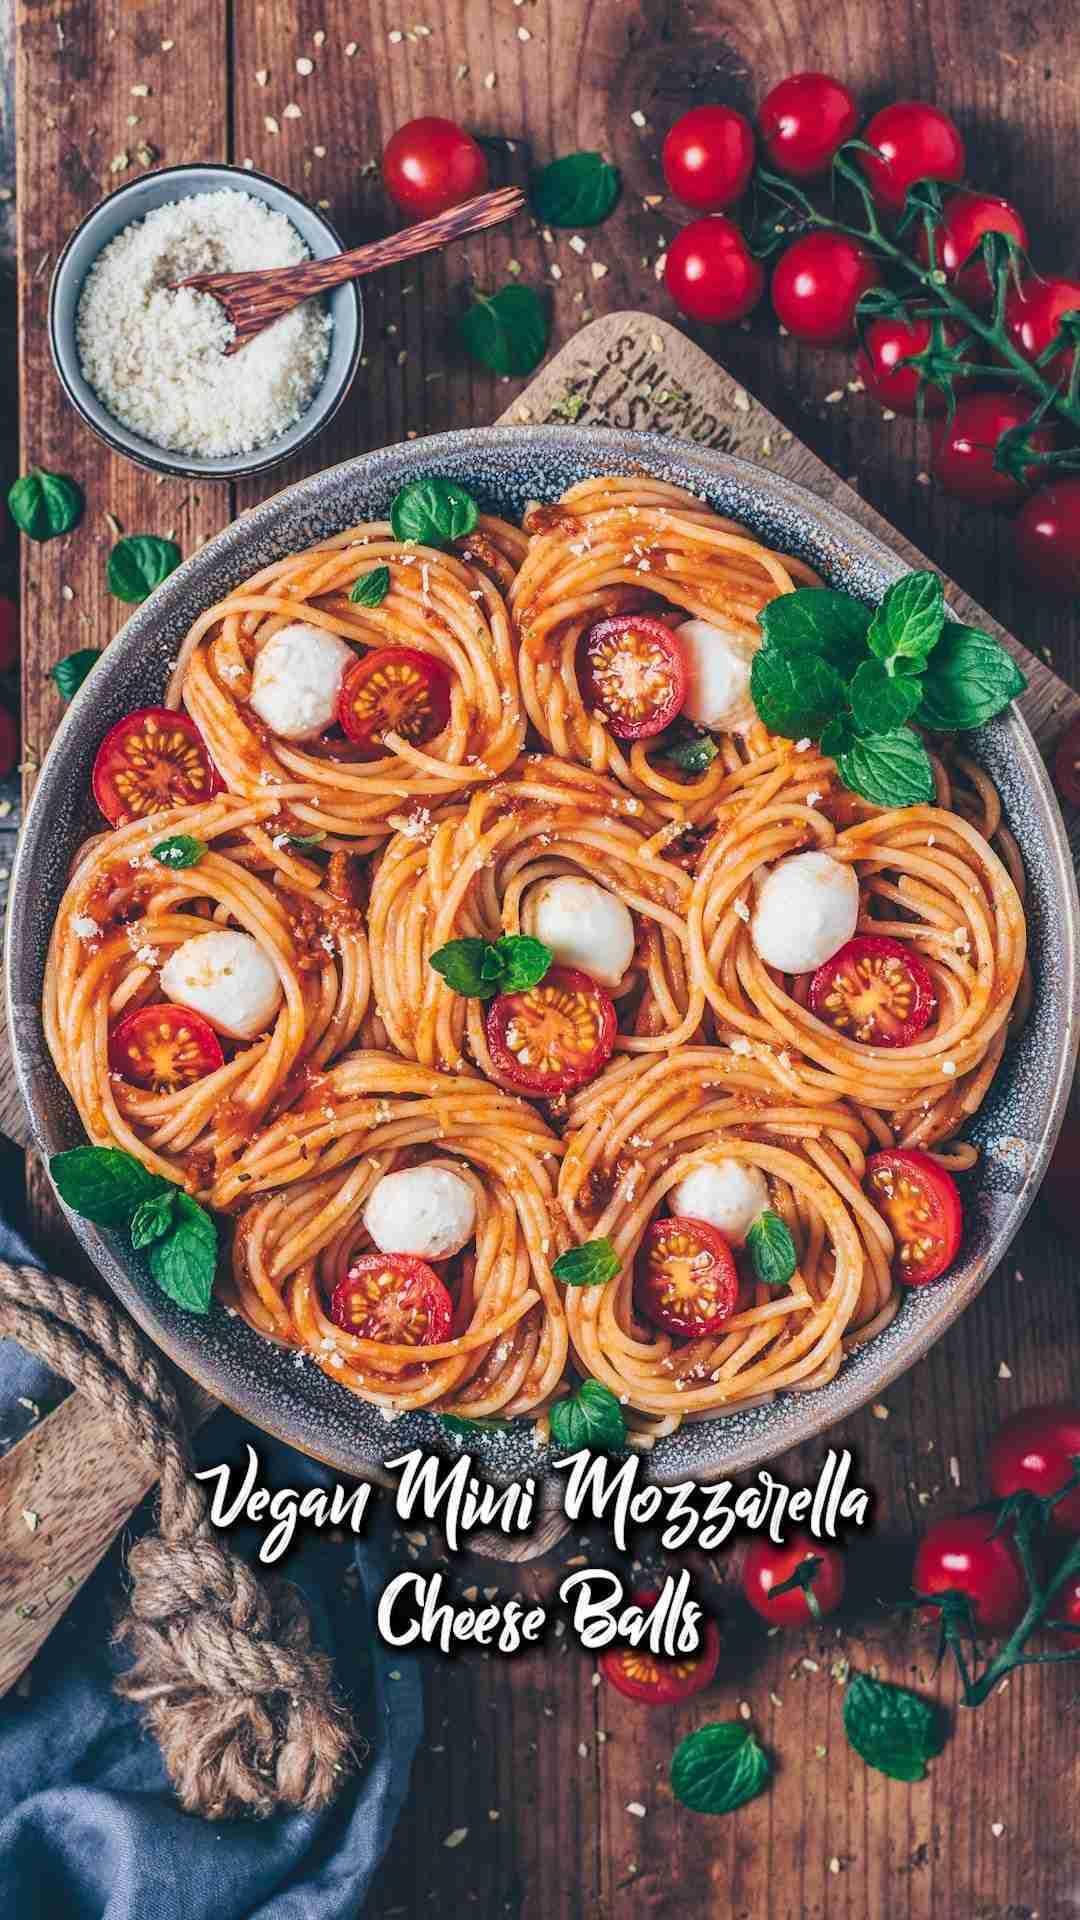 Vegan Mini Mozzarella Cheese Balls – The BEST Recipe!